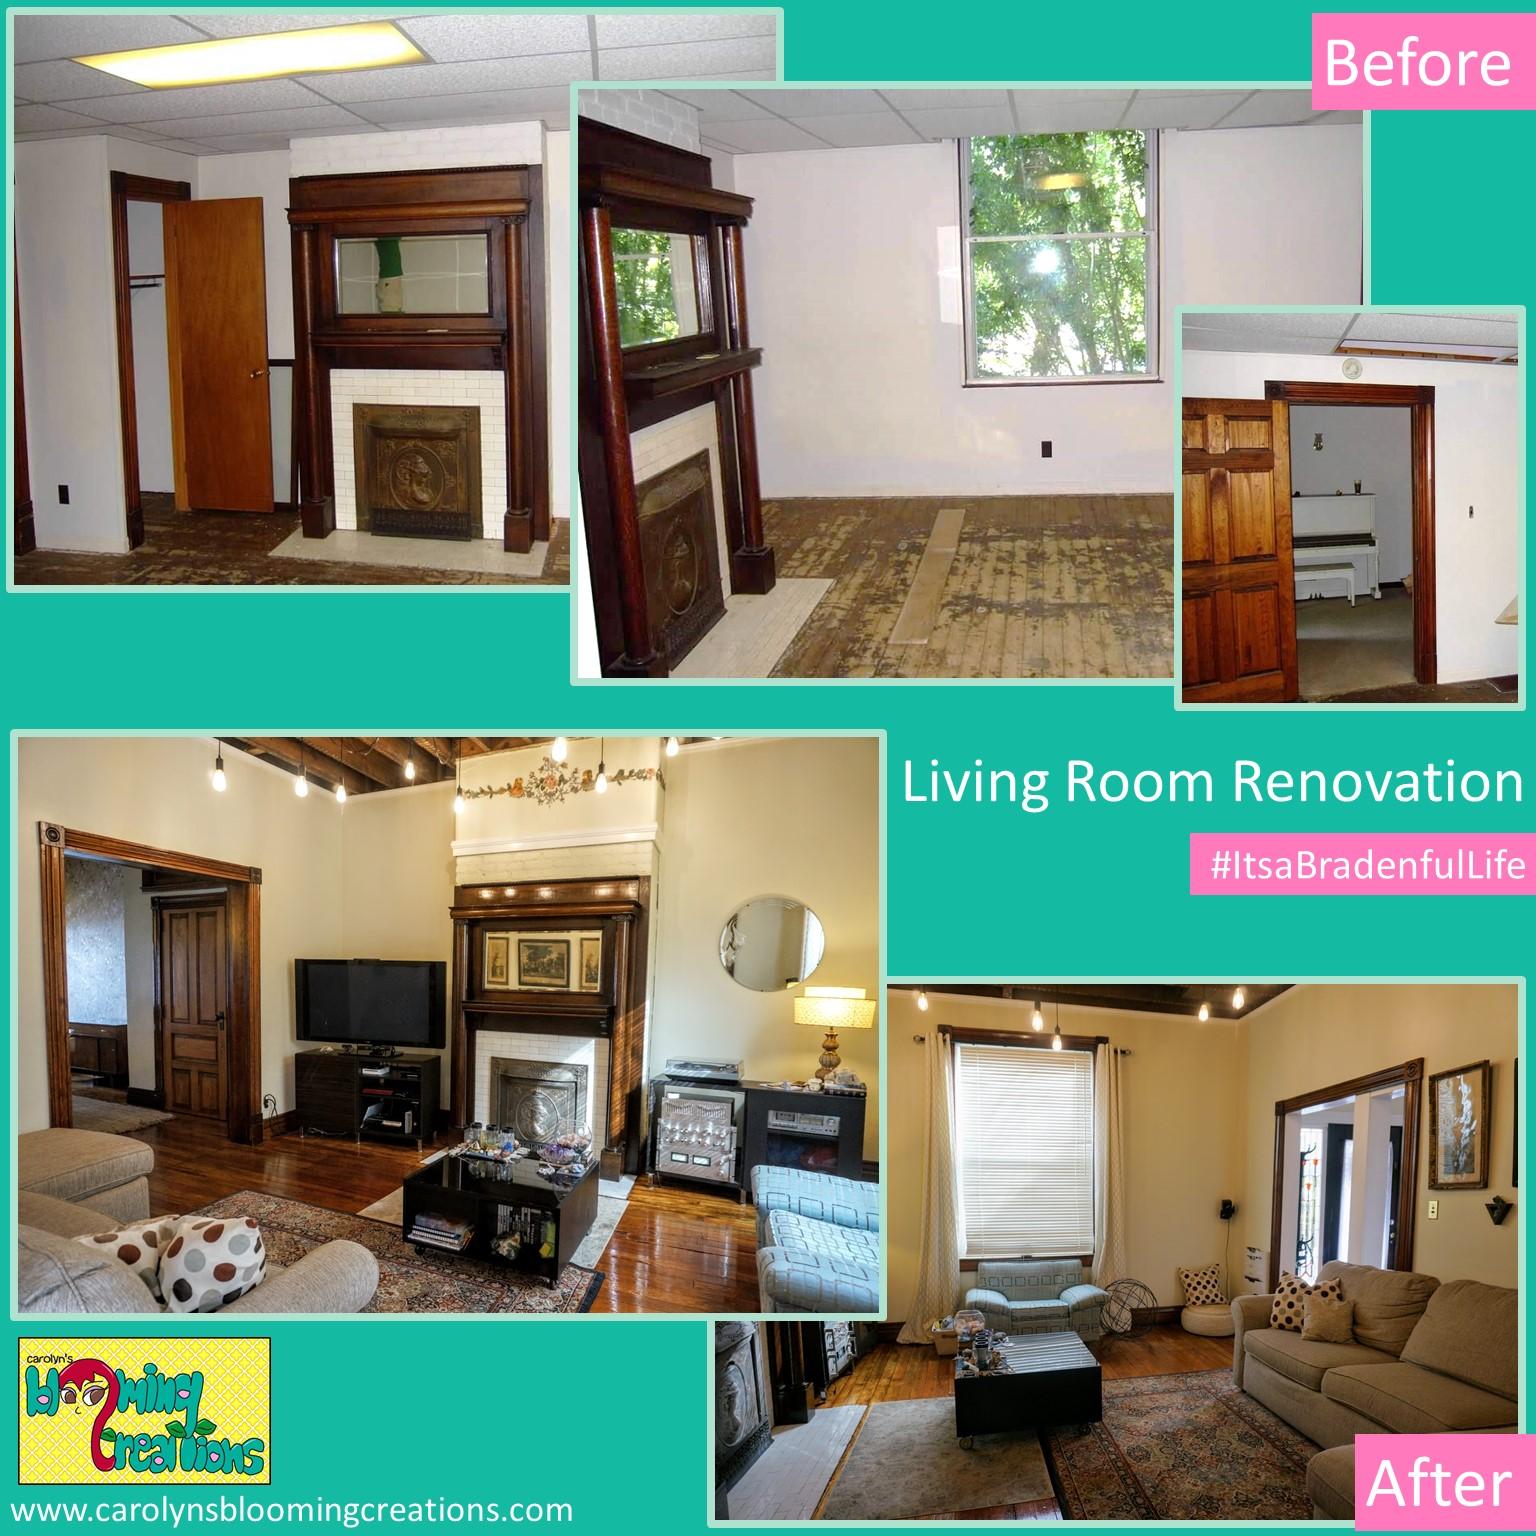 Photography by Carolyn J. Braden, Renovations by Tommy and Carolyn Braden